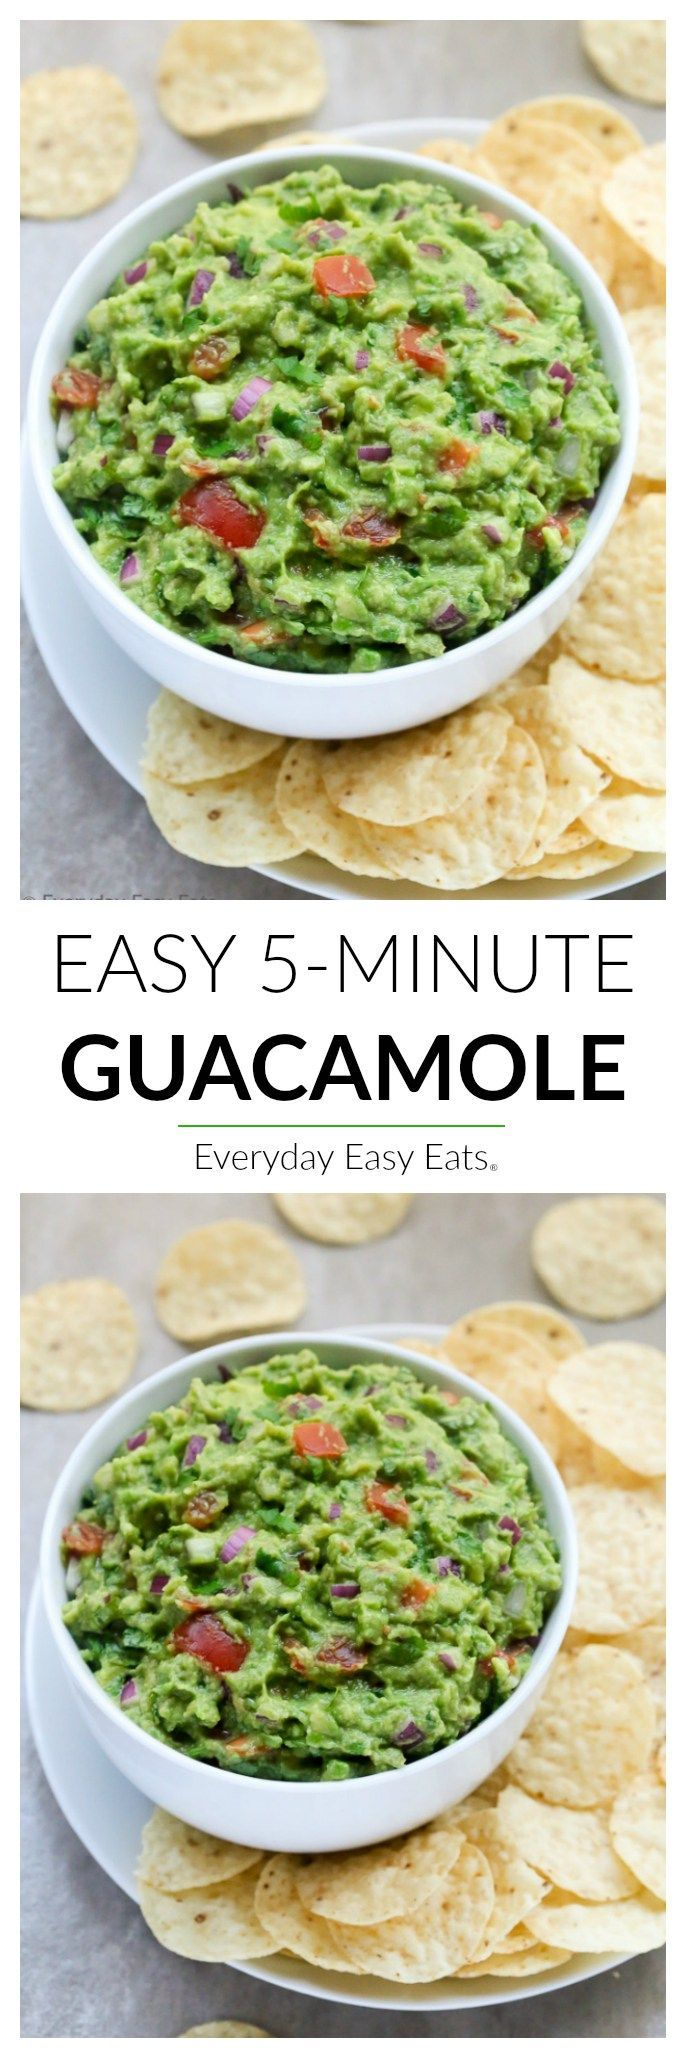 Basic Guacamole Recipe   EverydayEasyEats.com